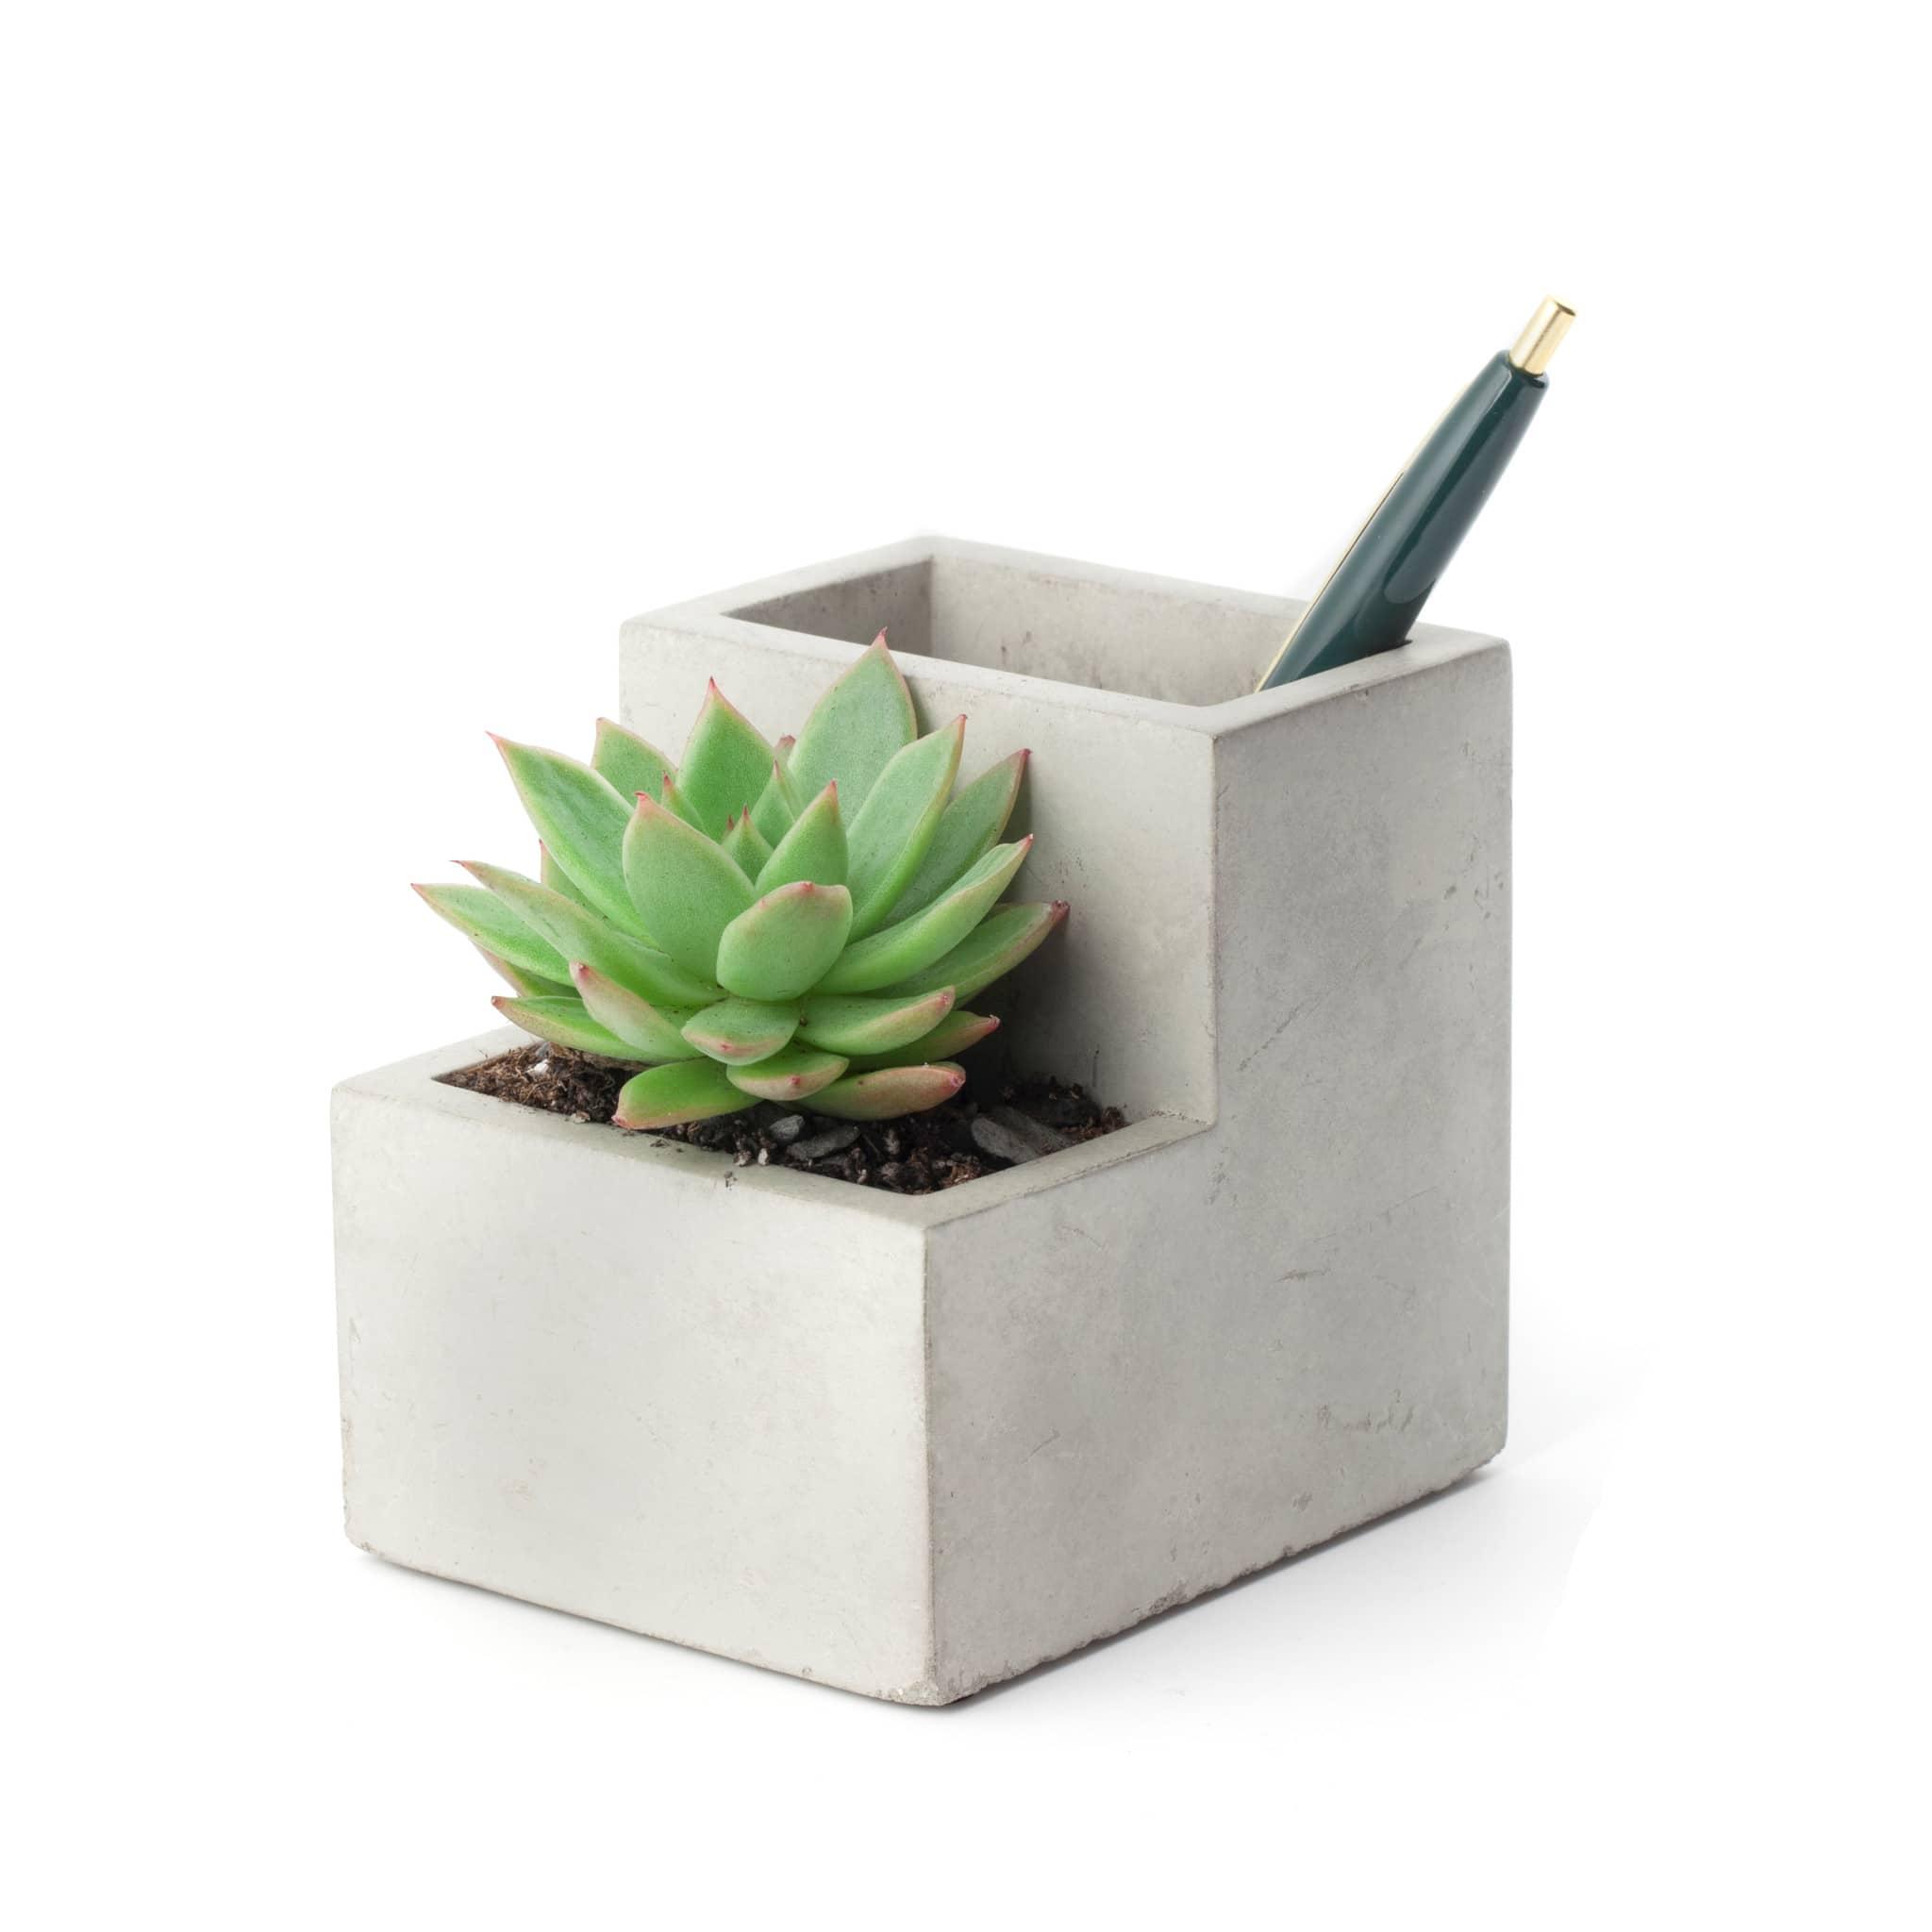 Kikkerland Design Small Concrete Desktop Planter